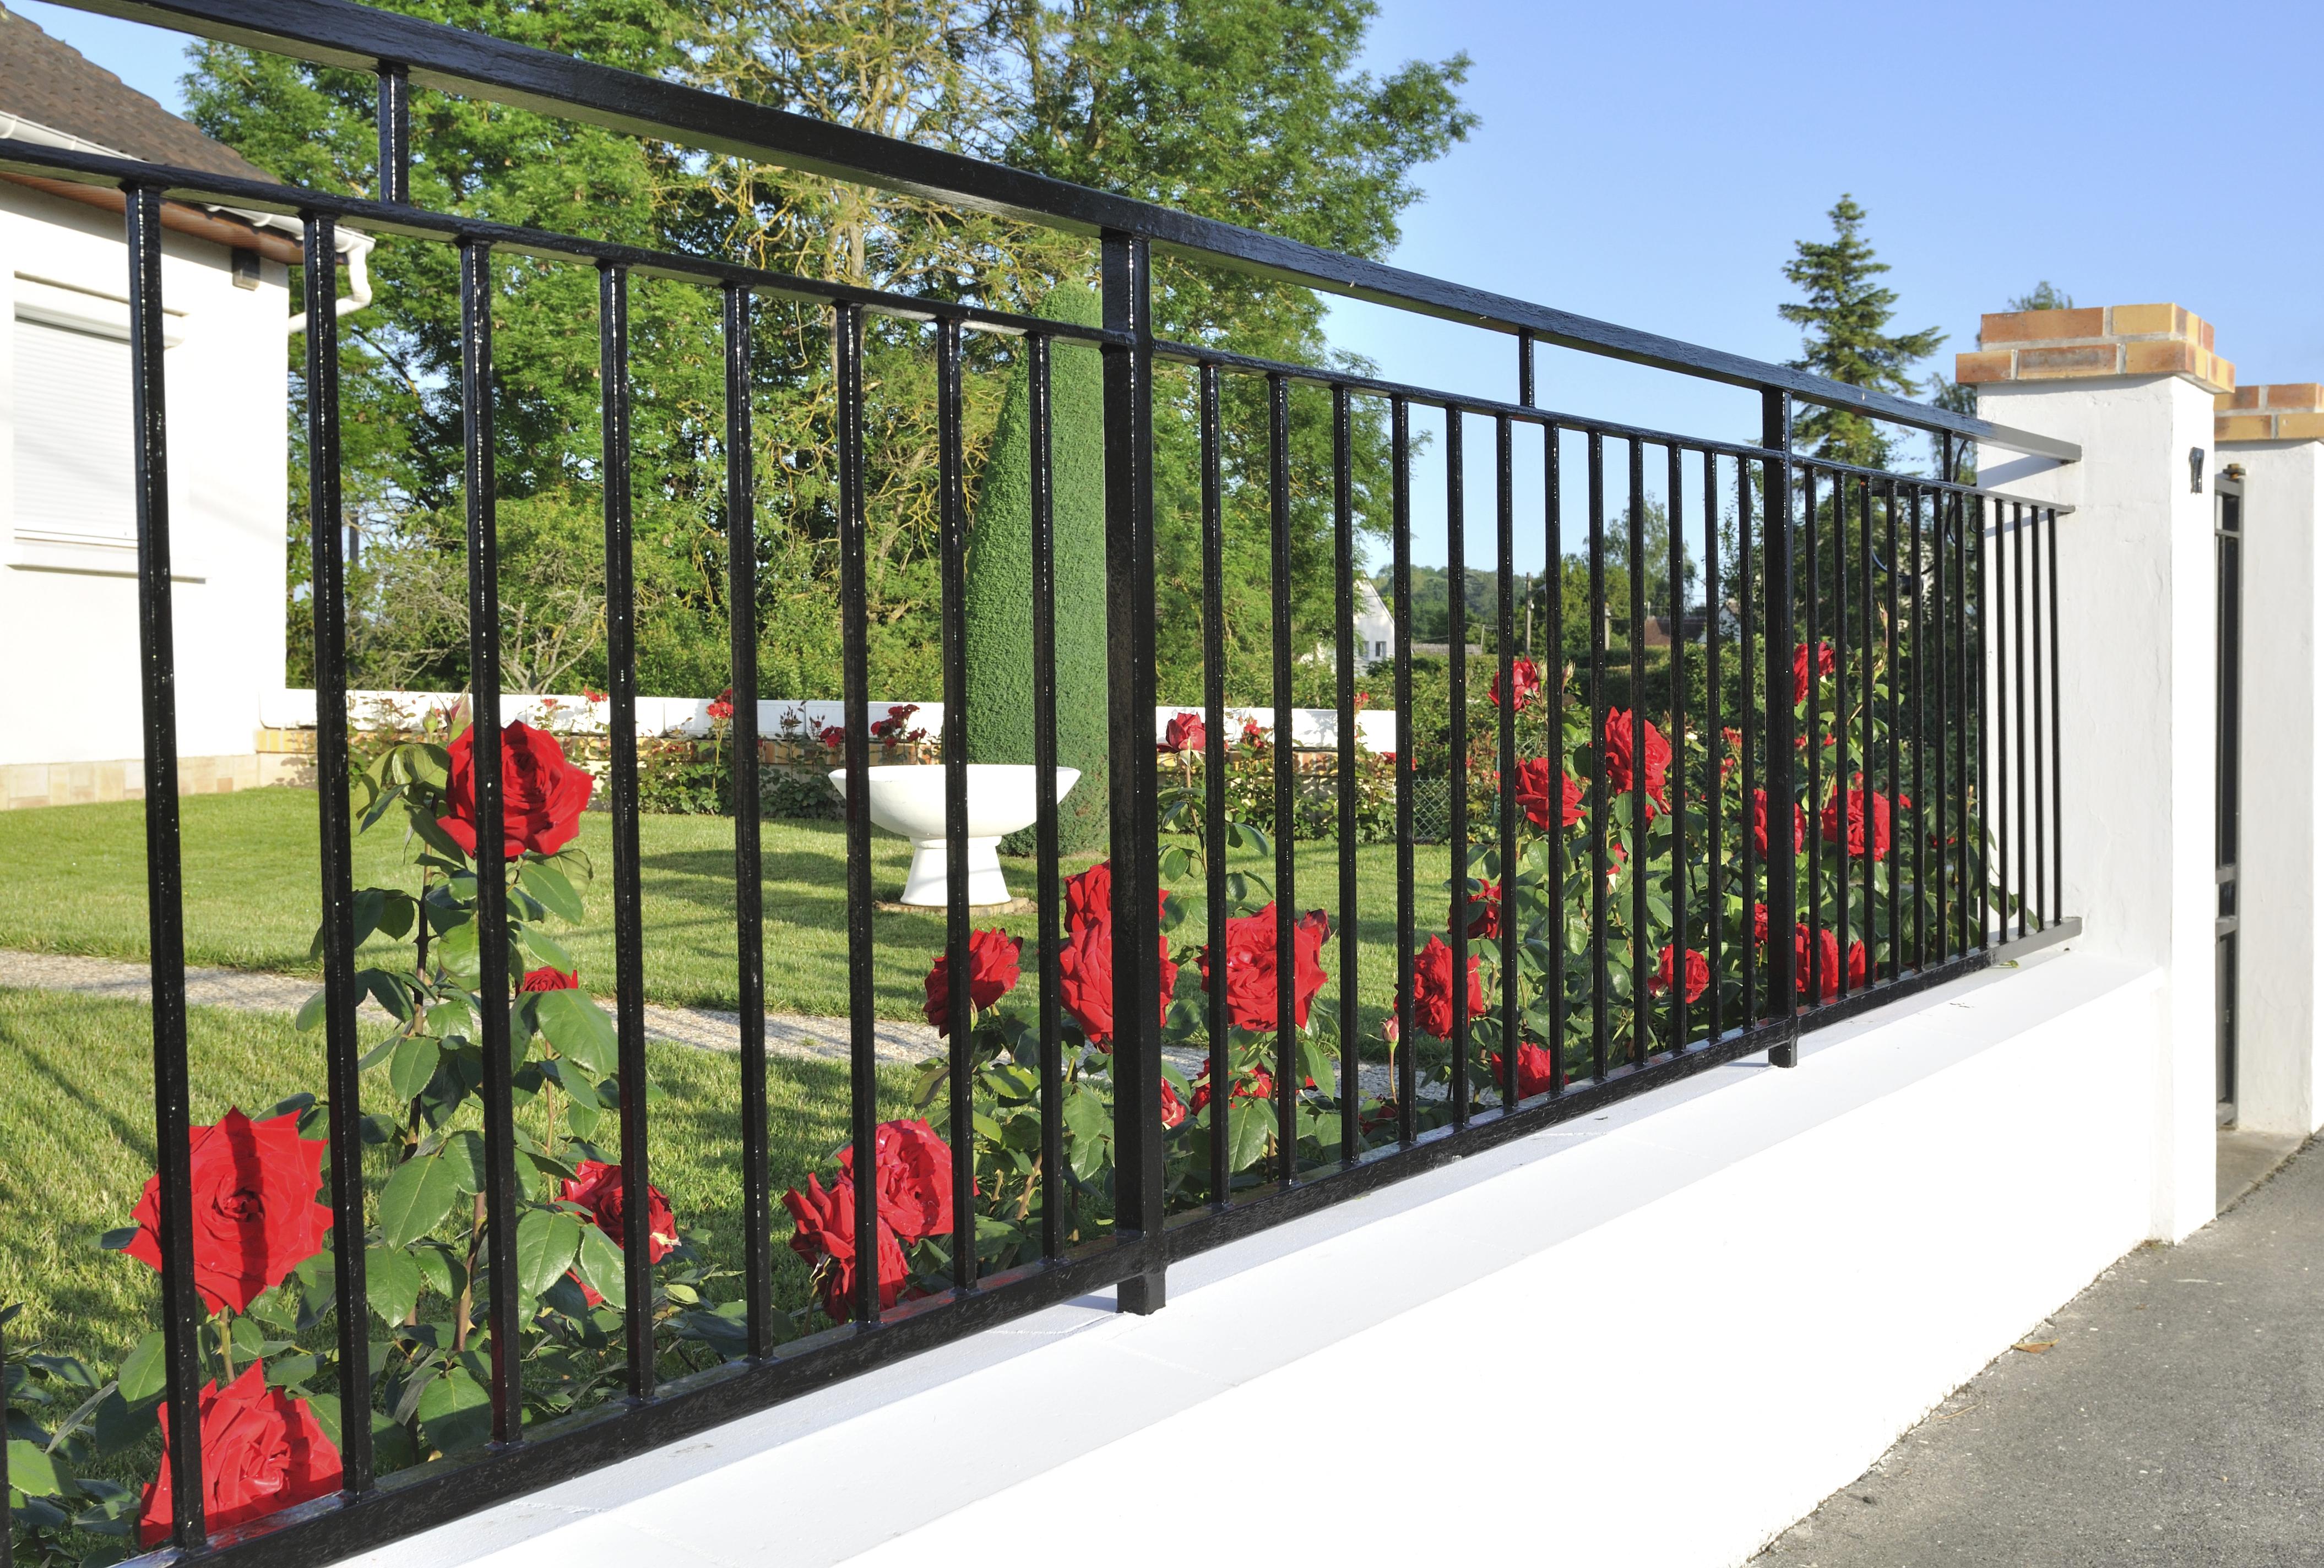 High security fences in the news berkley california